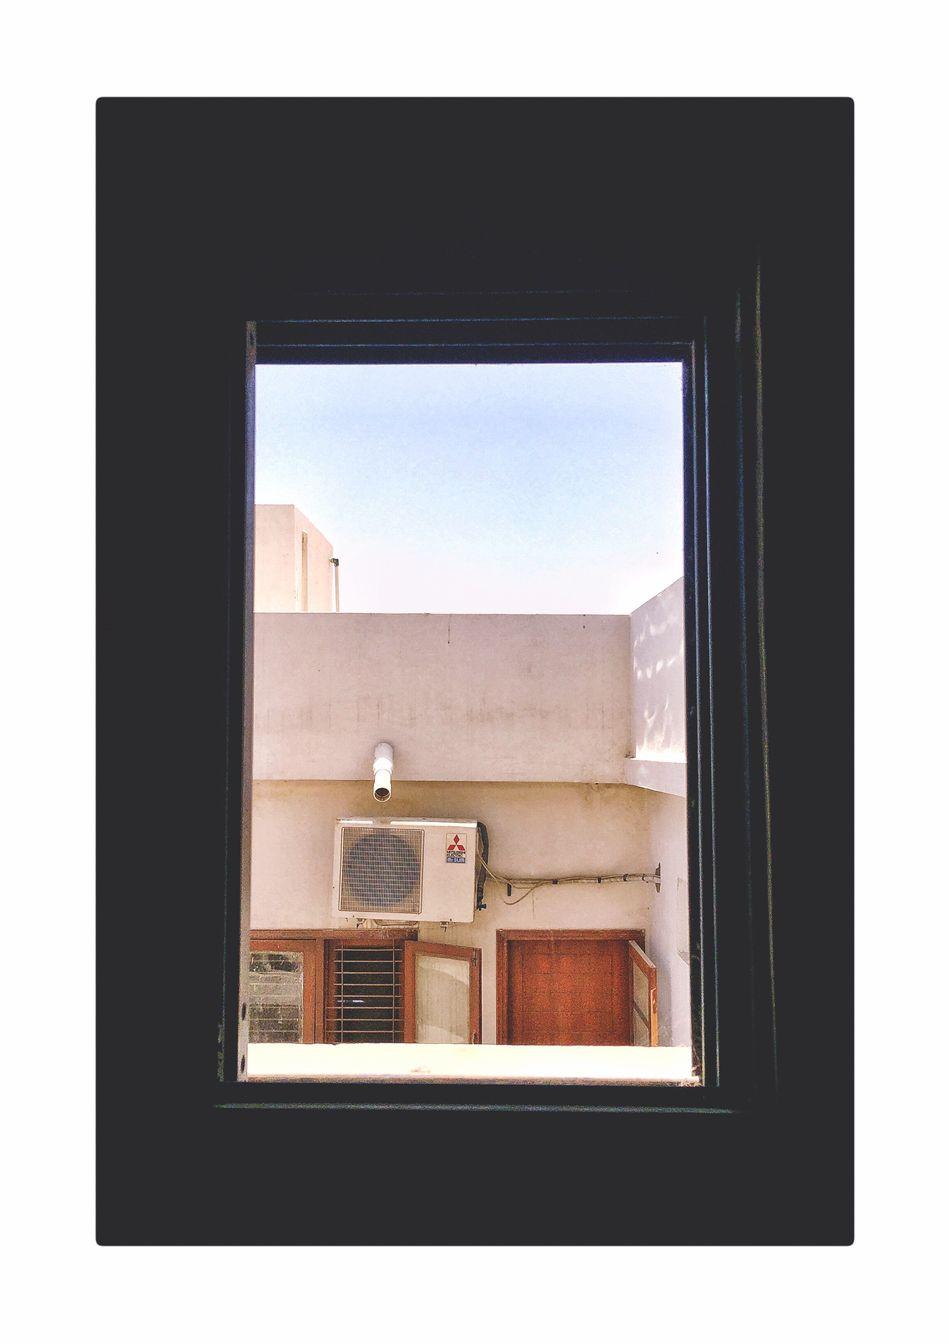 It isn't what it seems like Window Architecture Building Exterior Built Structure Eye4photography  EyeEmBestPics EyeEm Best Edits EyeEm EyeEm Best Shots EyeEm Gallery Eyeemphotography Karachi Frame It!